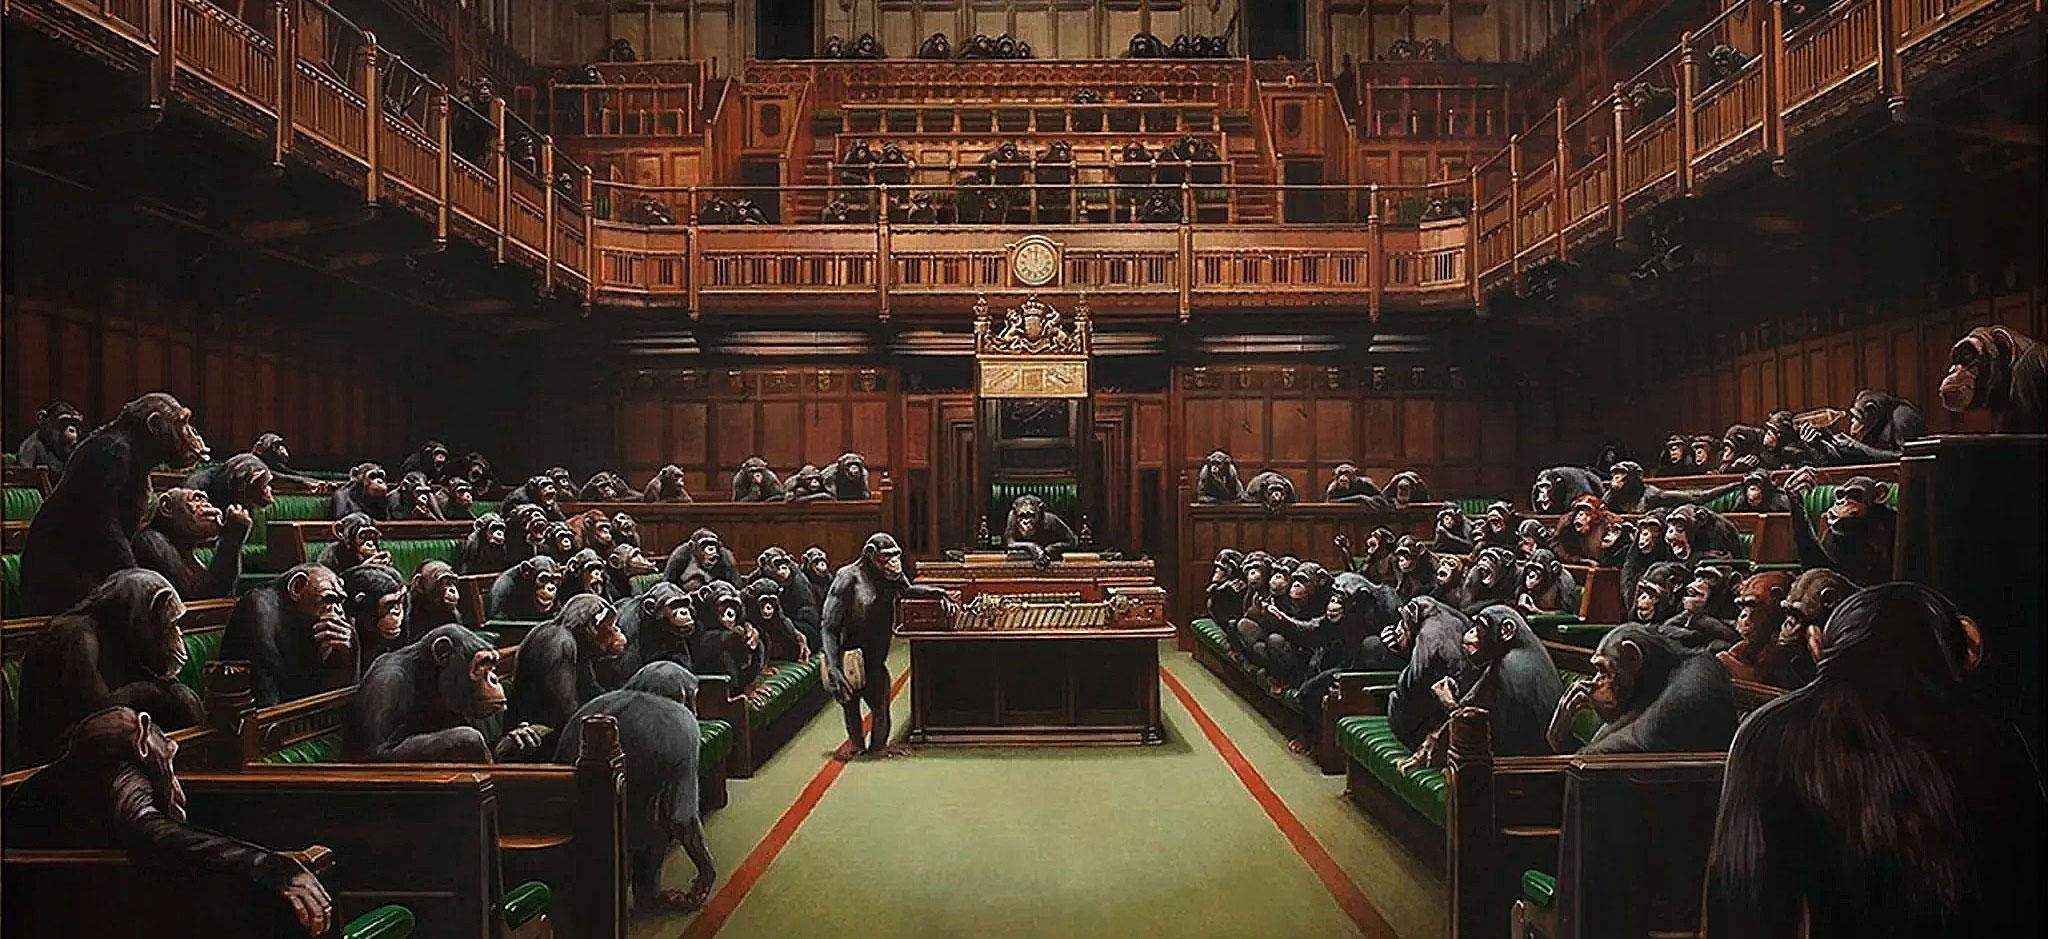 Banksy painting of MPs as chimpanzees